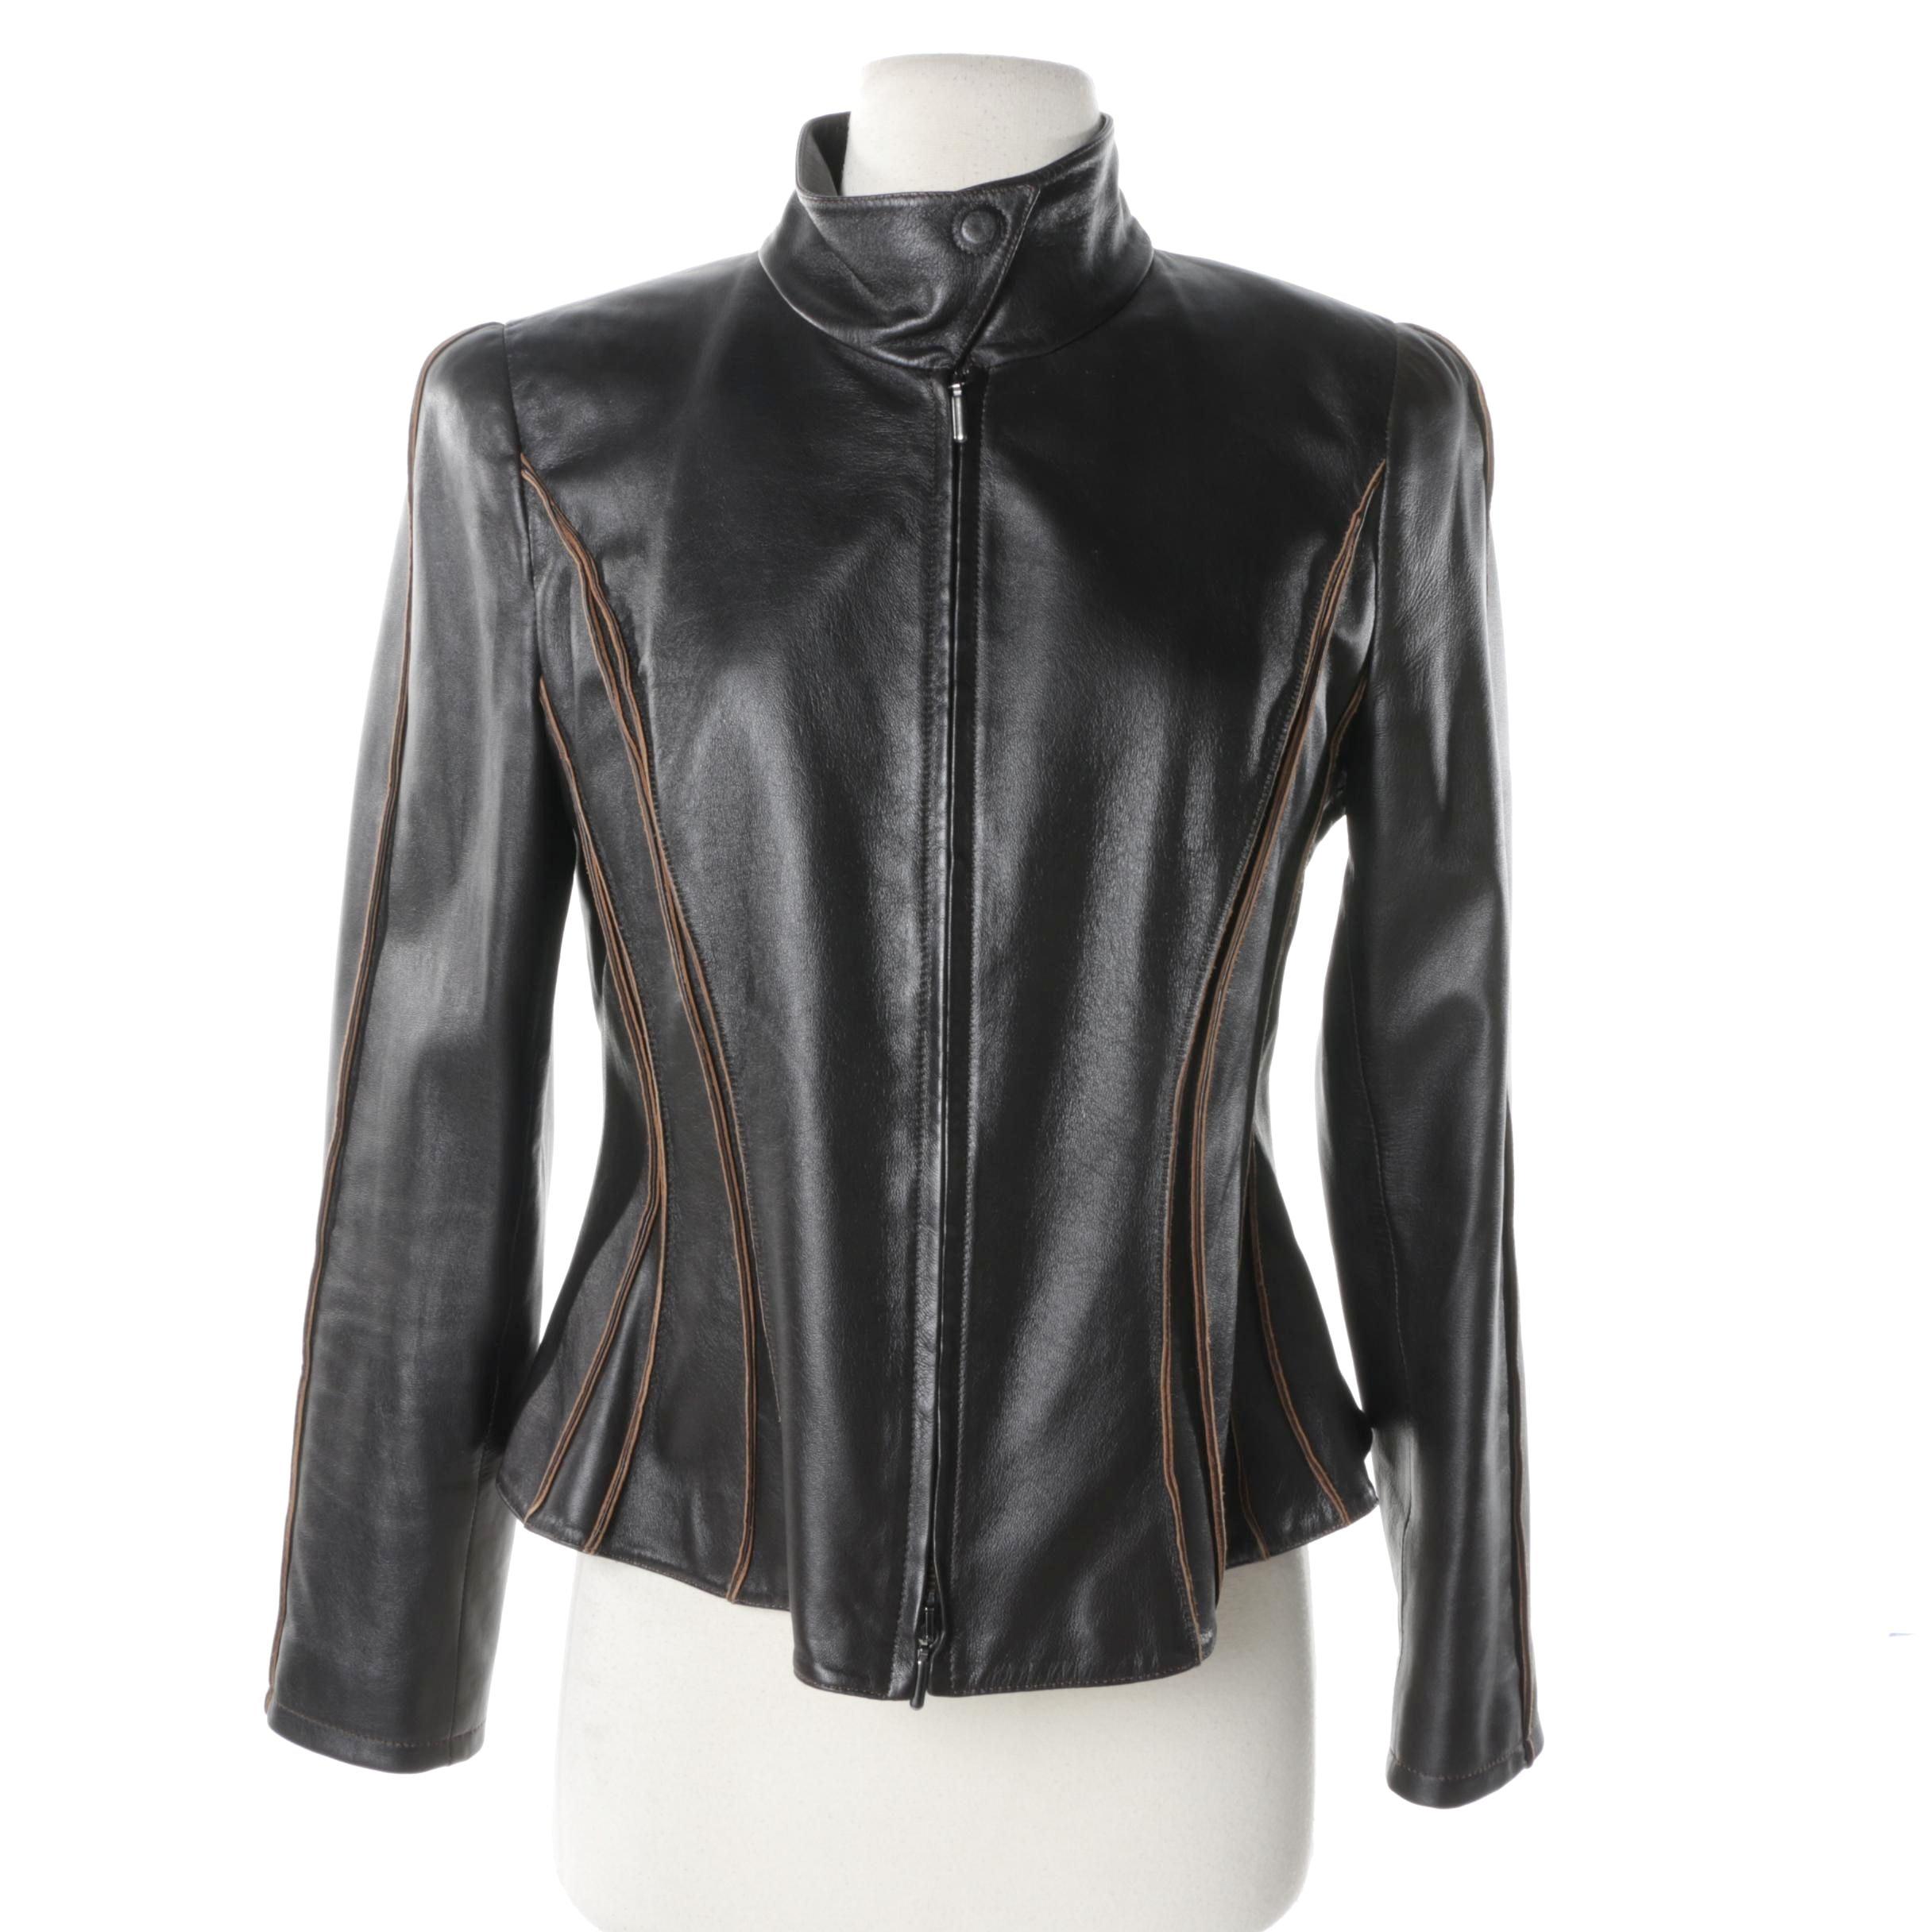 Giorgio Armani Collezioni Leather Motorcycle Jacket